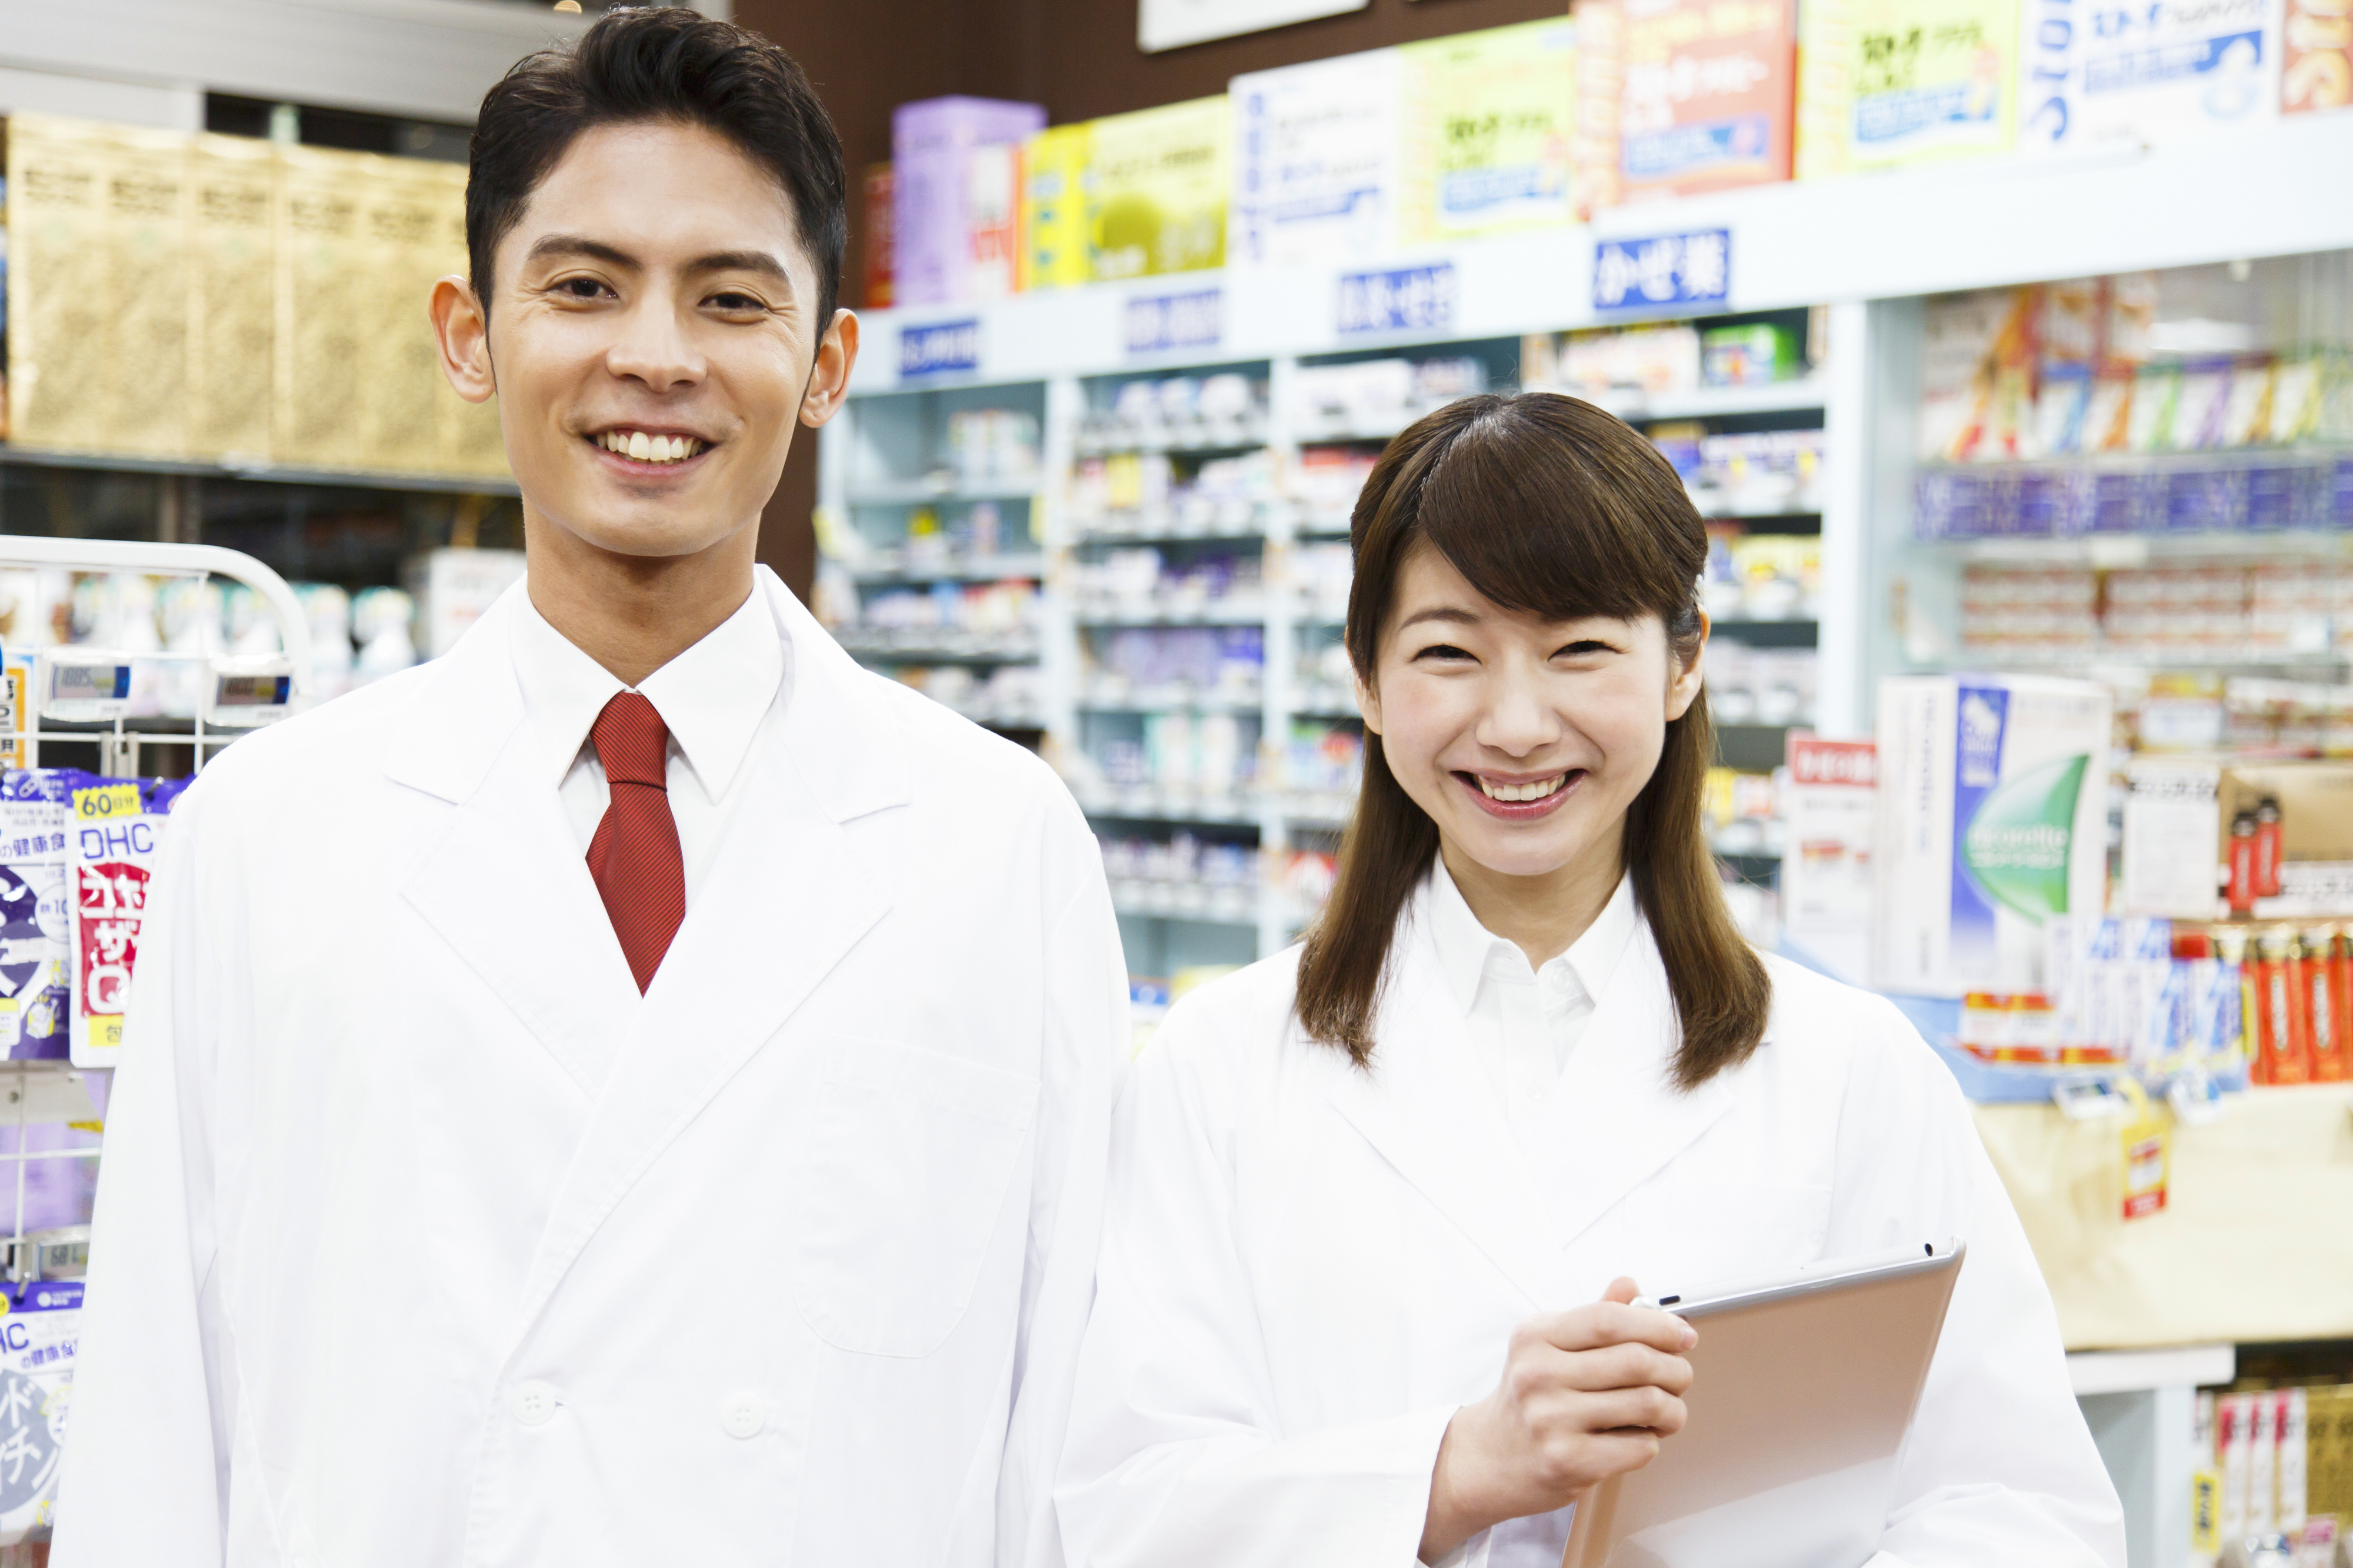 派遣薬剤師 派遣会社の選び方